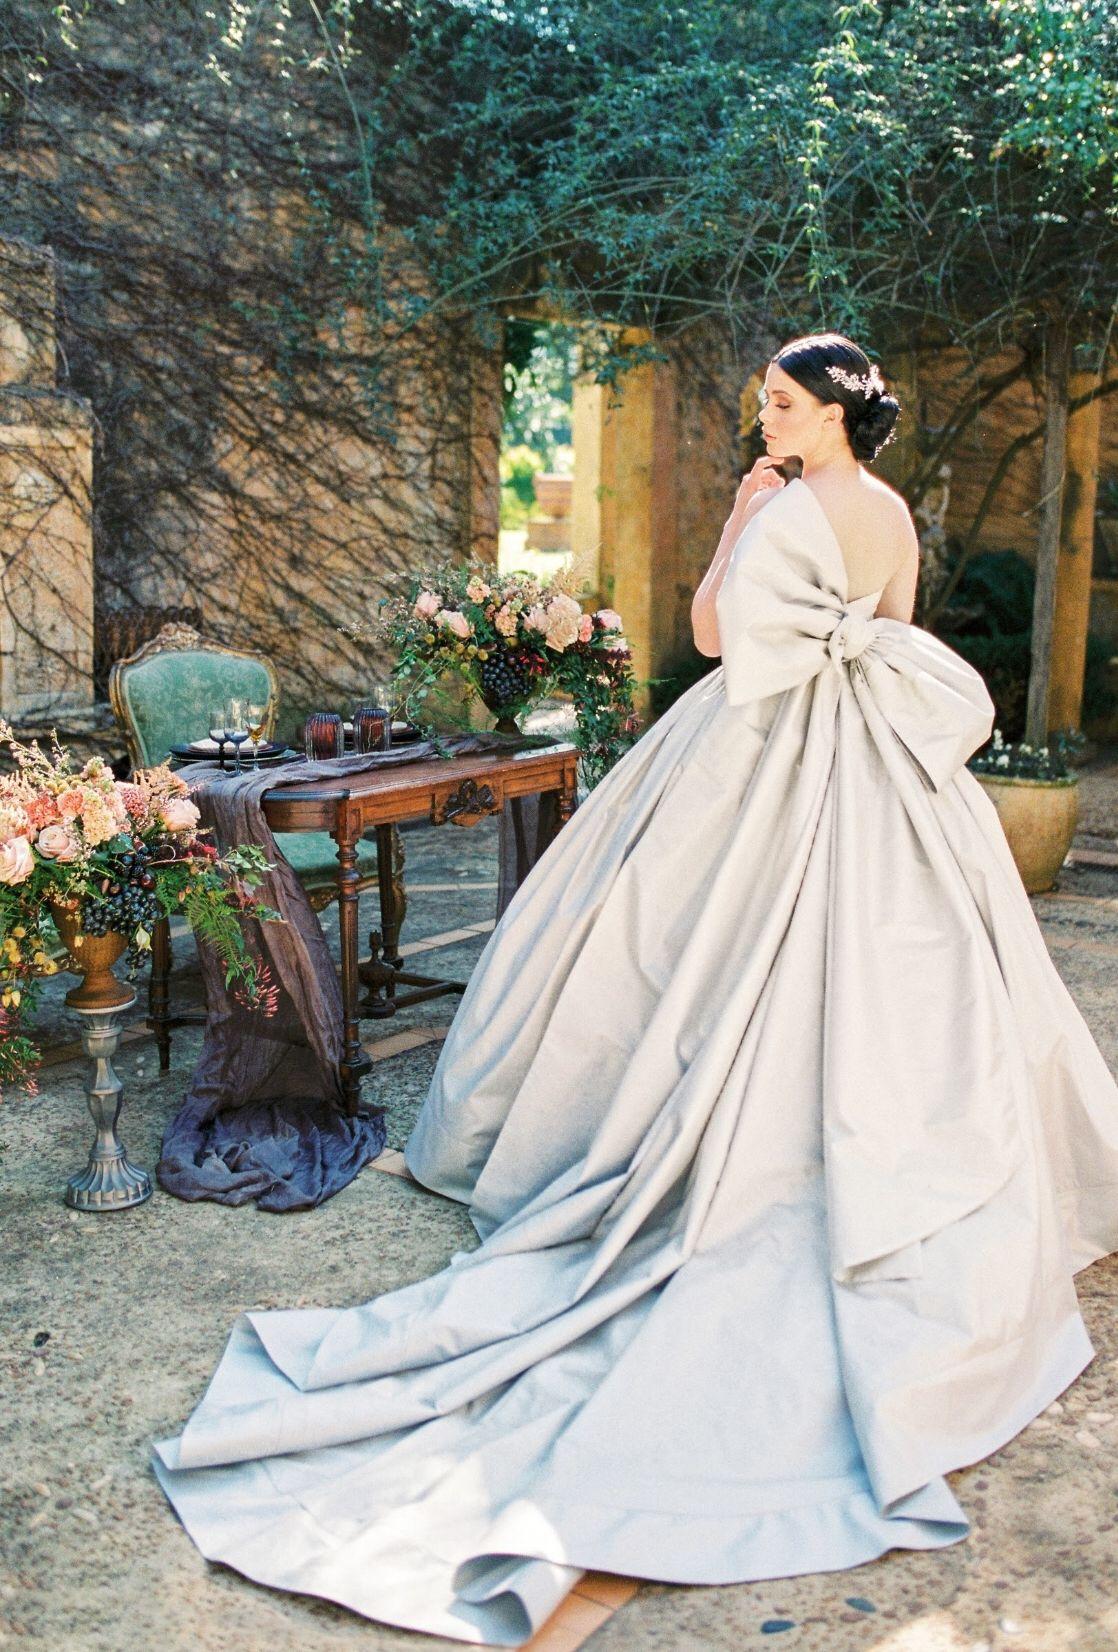 Viktoria Wedding Gown Designed By Ulyana Aster The Viktoria Gown Is A Fairytale Inspir European Wedding Dresses Ball Gowns Wedding Fairy Tale Wedding Dress